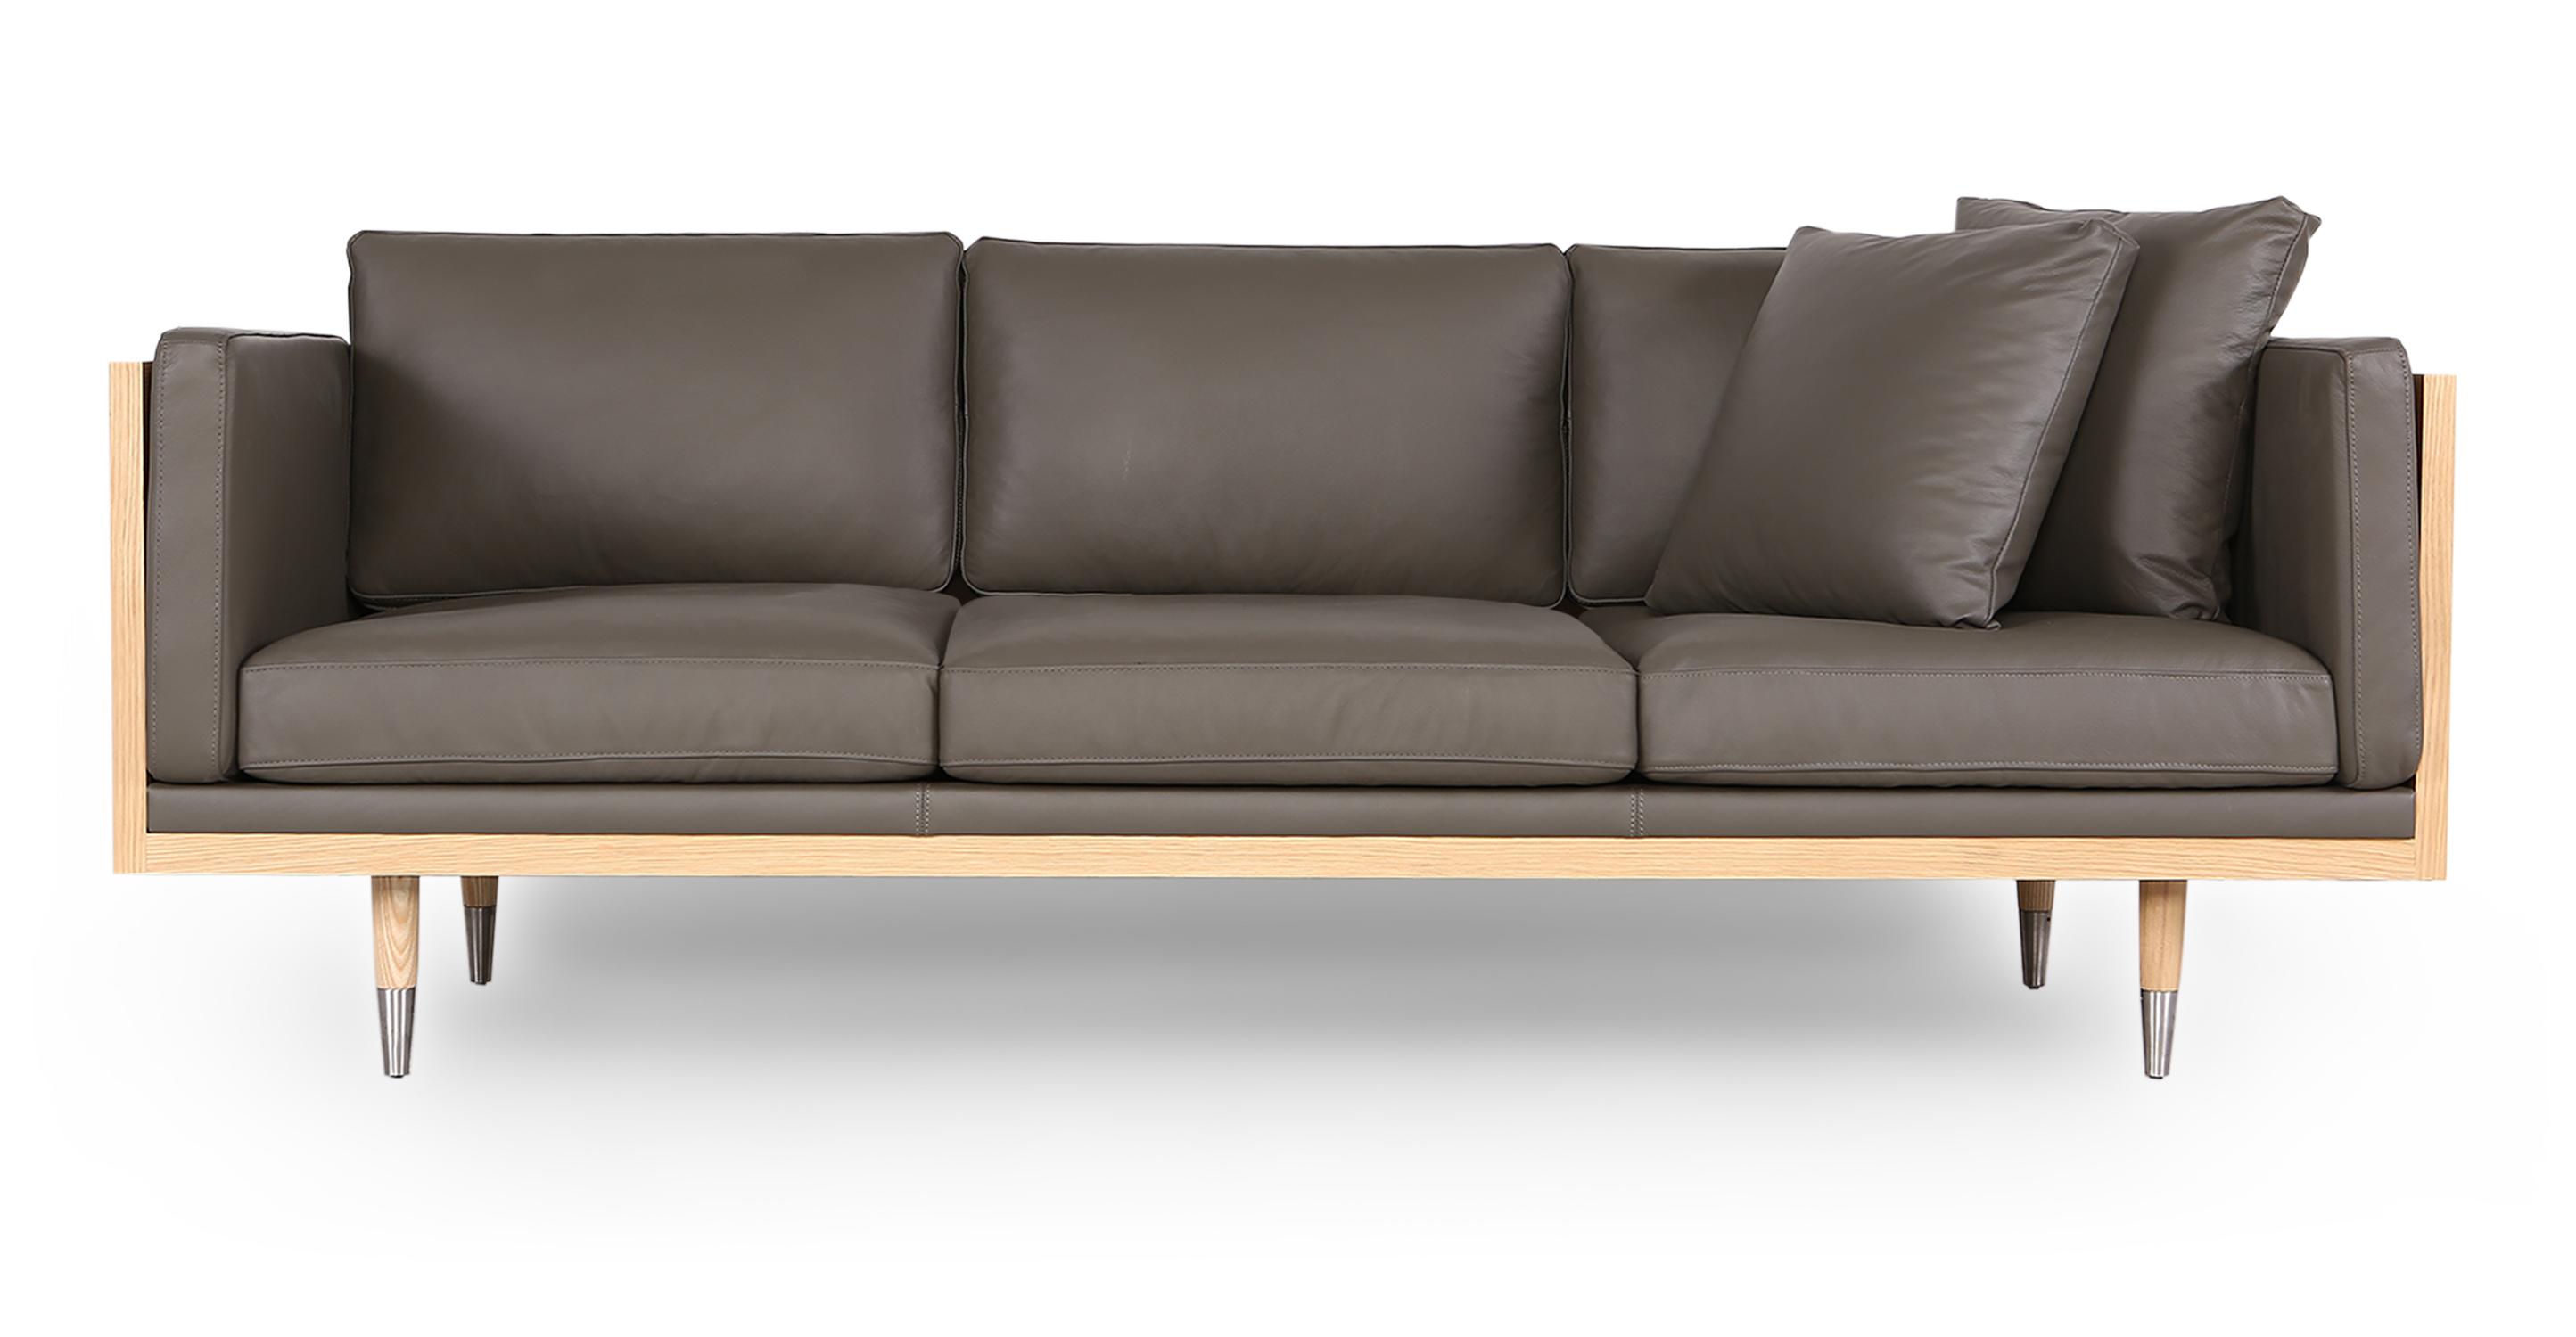 "Woodrow Lush 87"" Leather Sofa, Ash/Grey Aniline"